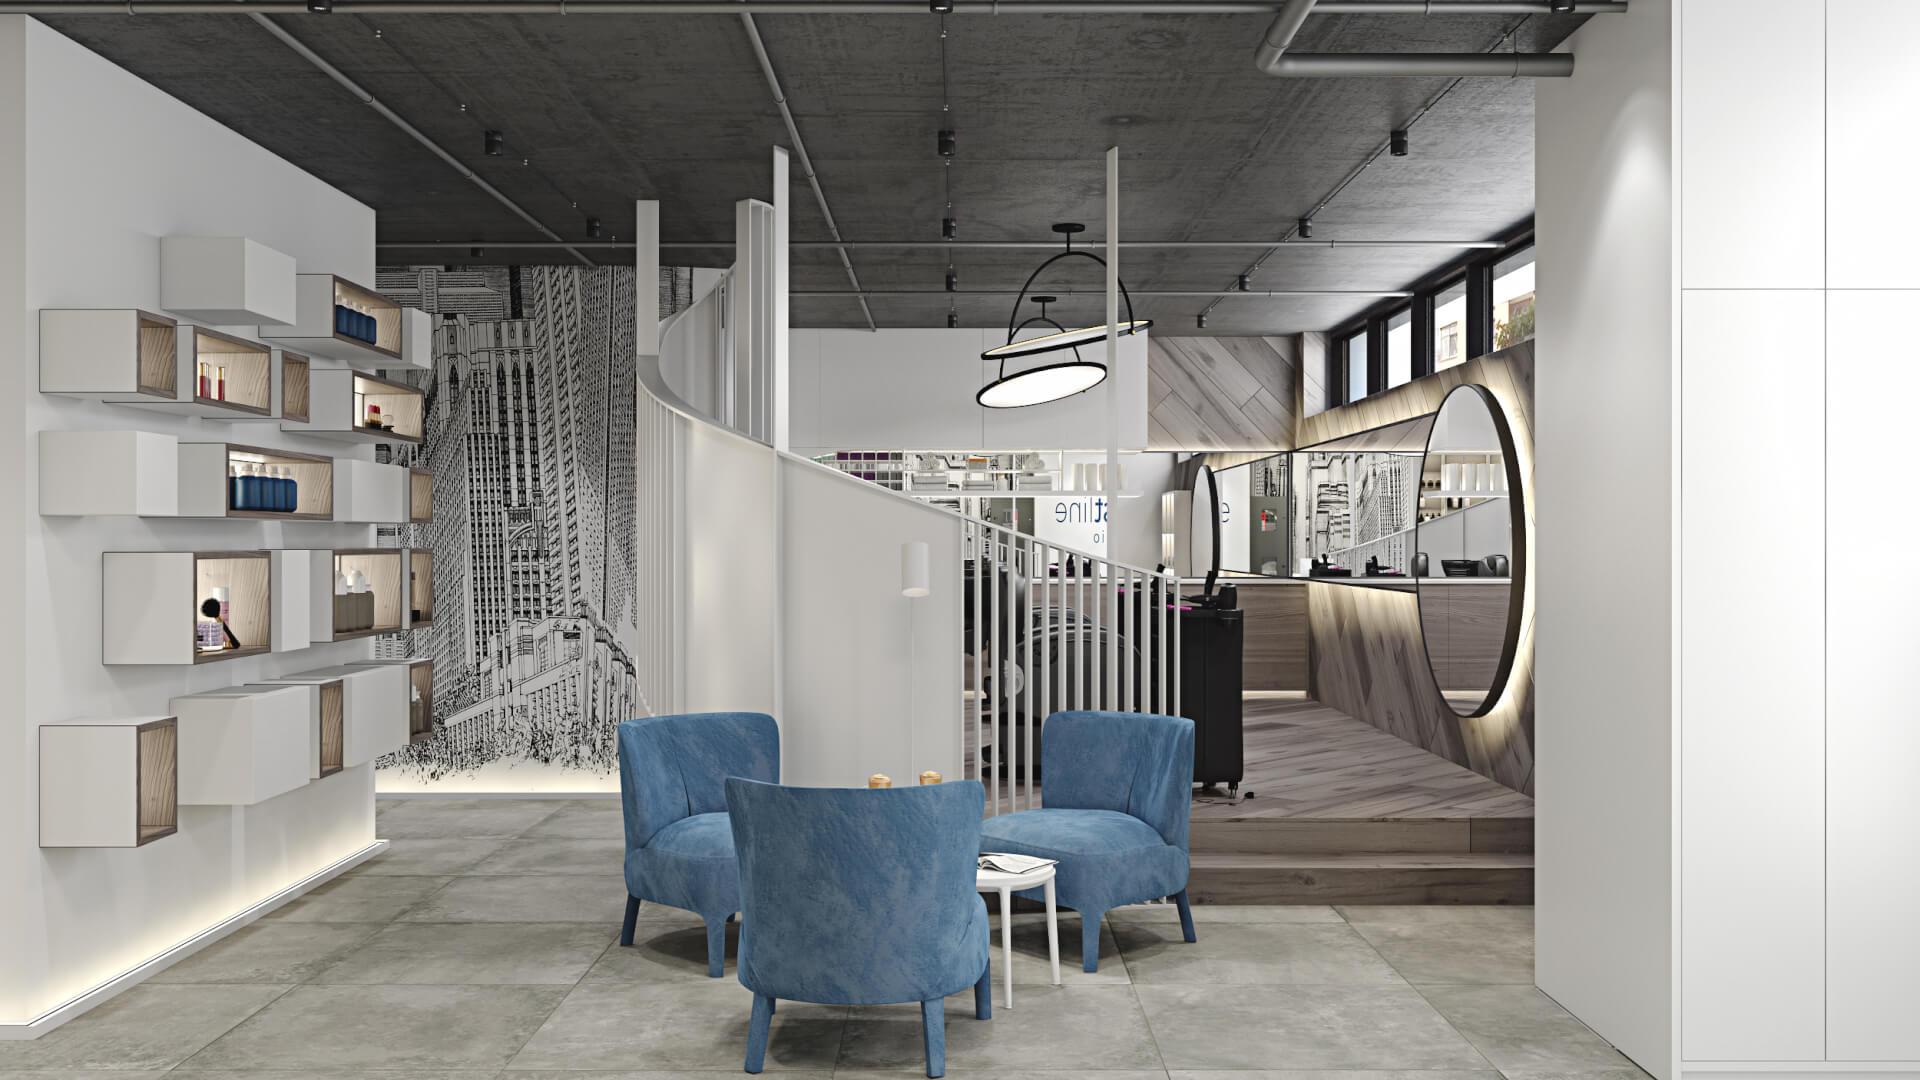 Salon_Bulvar_Fontanov_KN_01_View020002